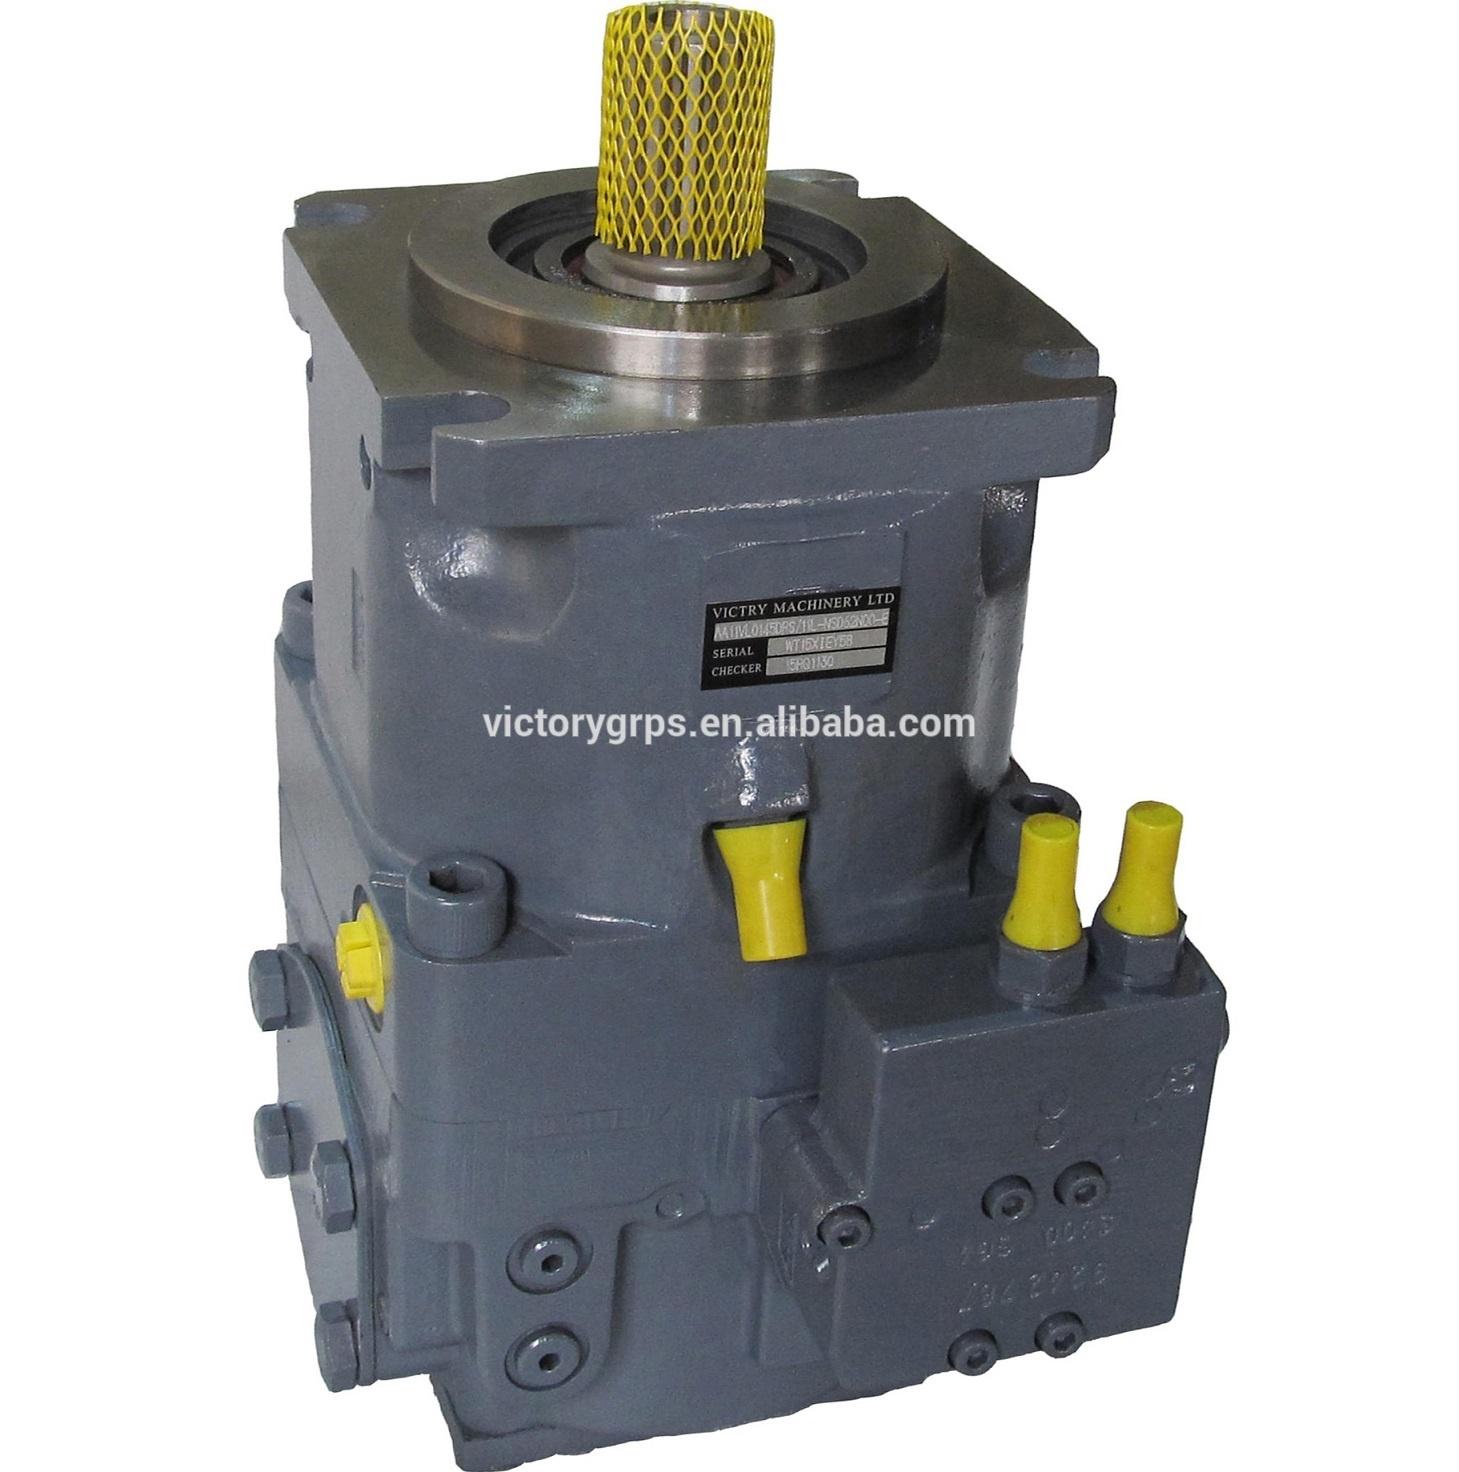 Hydraulic Axial Piston Rexroth A11VO Pump A11VO95 A11VO130 A11VO190 A11VO145 A11VO75 A11VO260